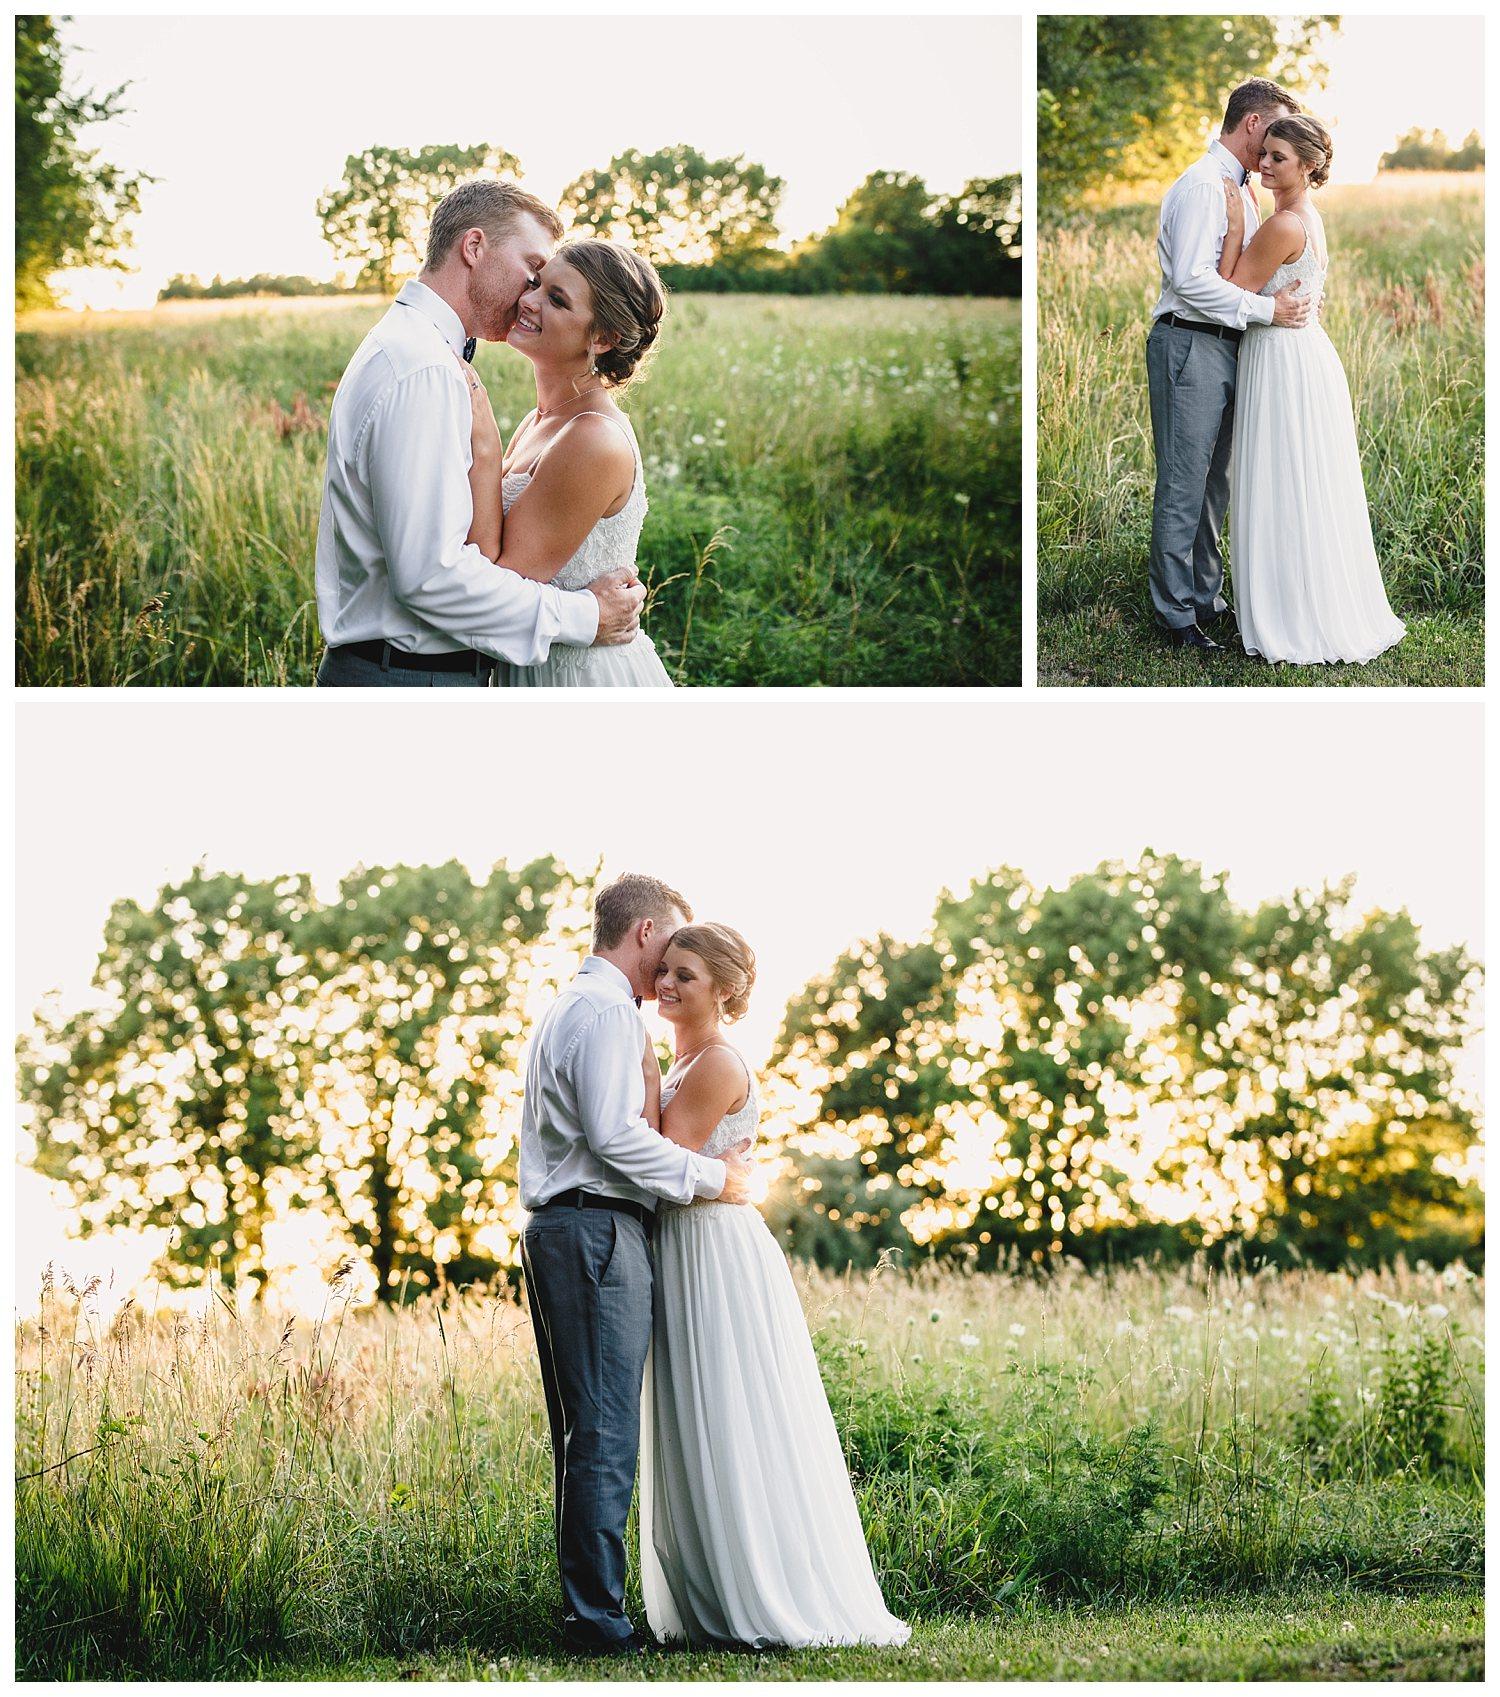 Kelsey_Diane_Photography_Kansas_City_Engagement_Wedding_Photographer_Midwest_Traveling_Missouri_Lee_Andrew_Hall_And_Garden_Blue_Springs_Wedding_Clayton_Kimberly_Summer_Wedding_0851.jpg